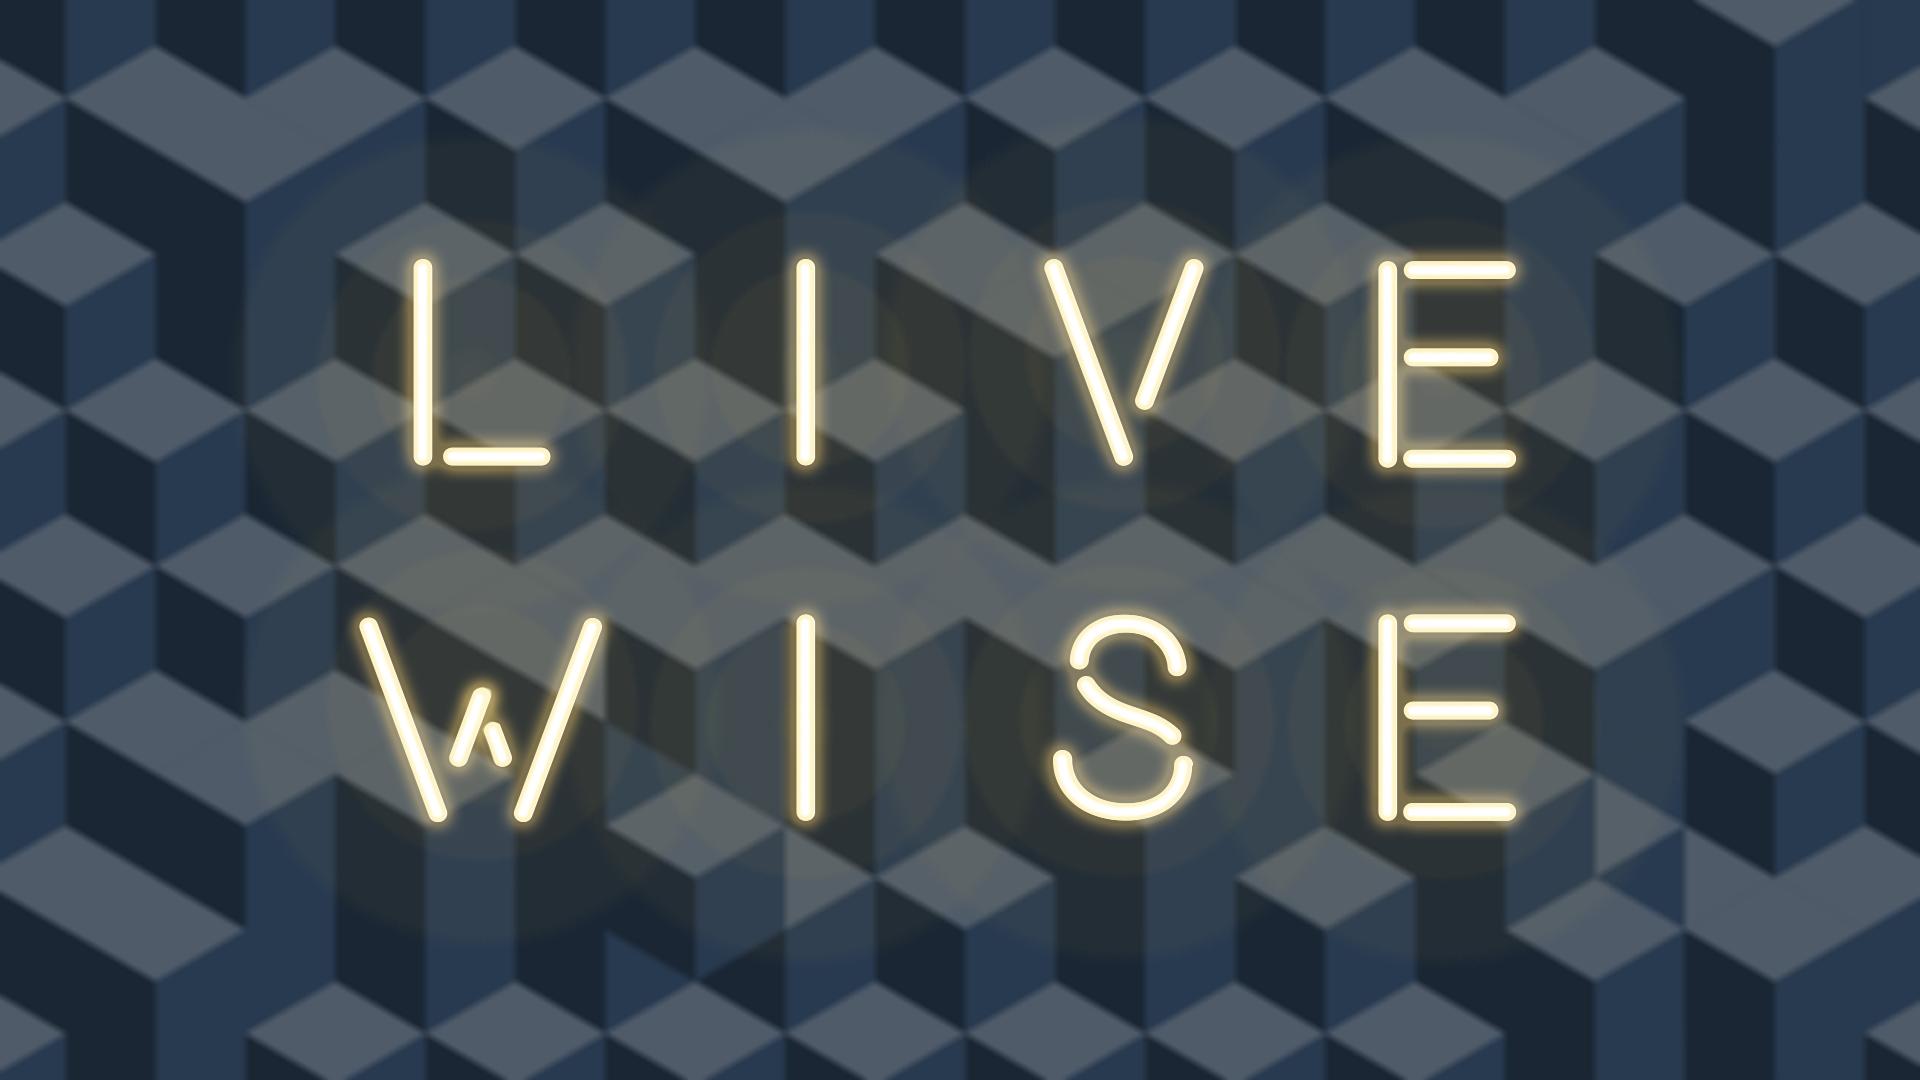 Live Wise 1.jpg